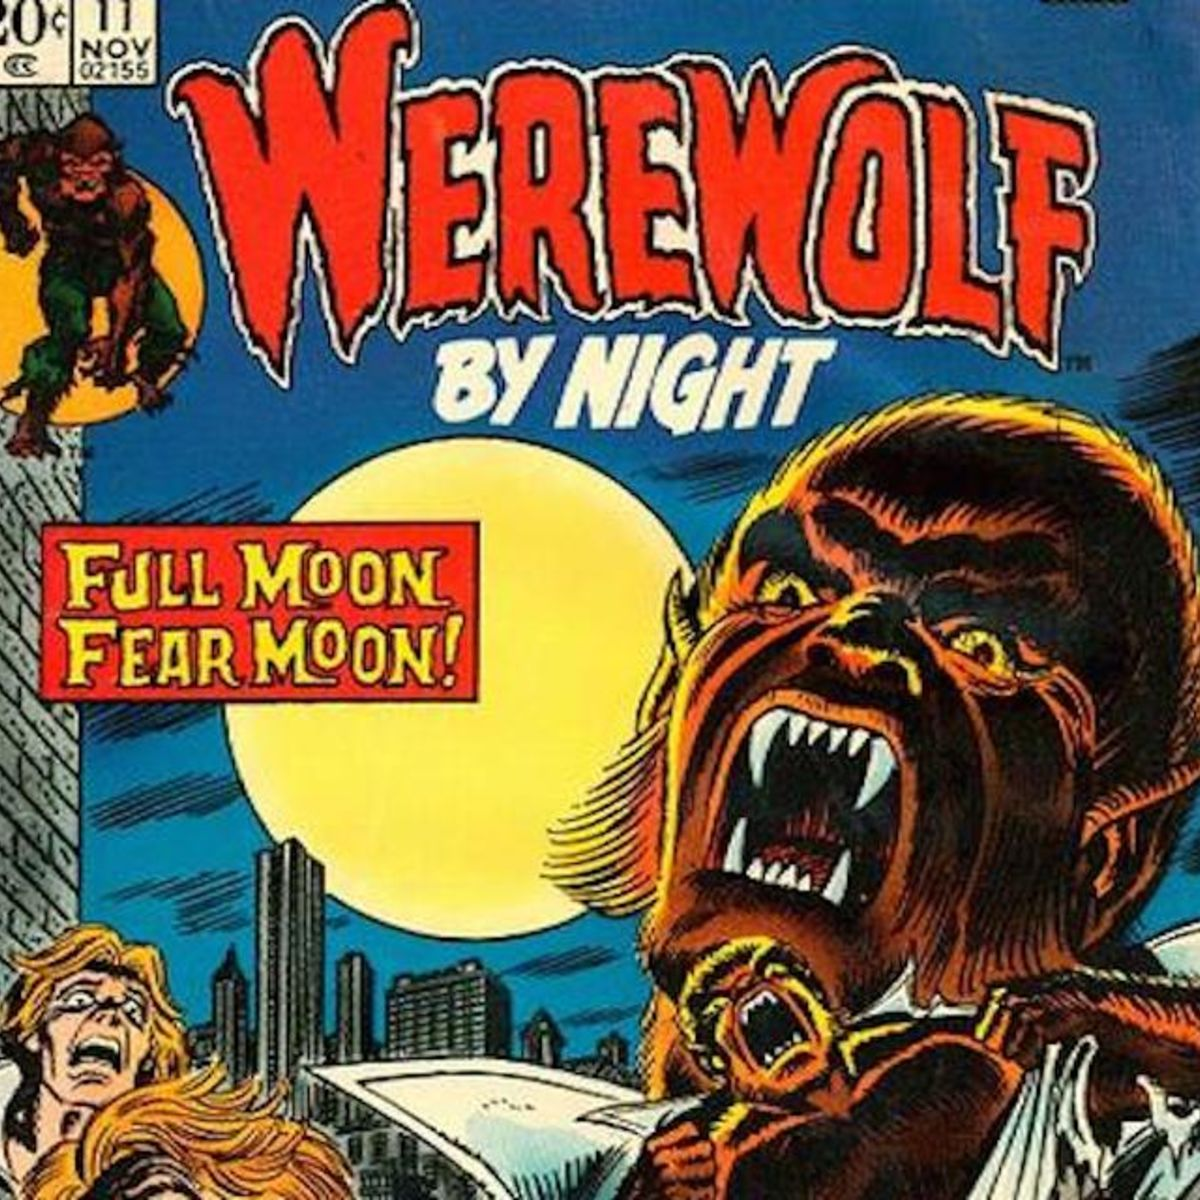 Werewolf_by_Night_Vol_1_11_0.jpg